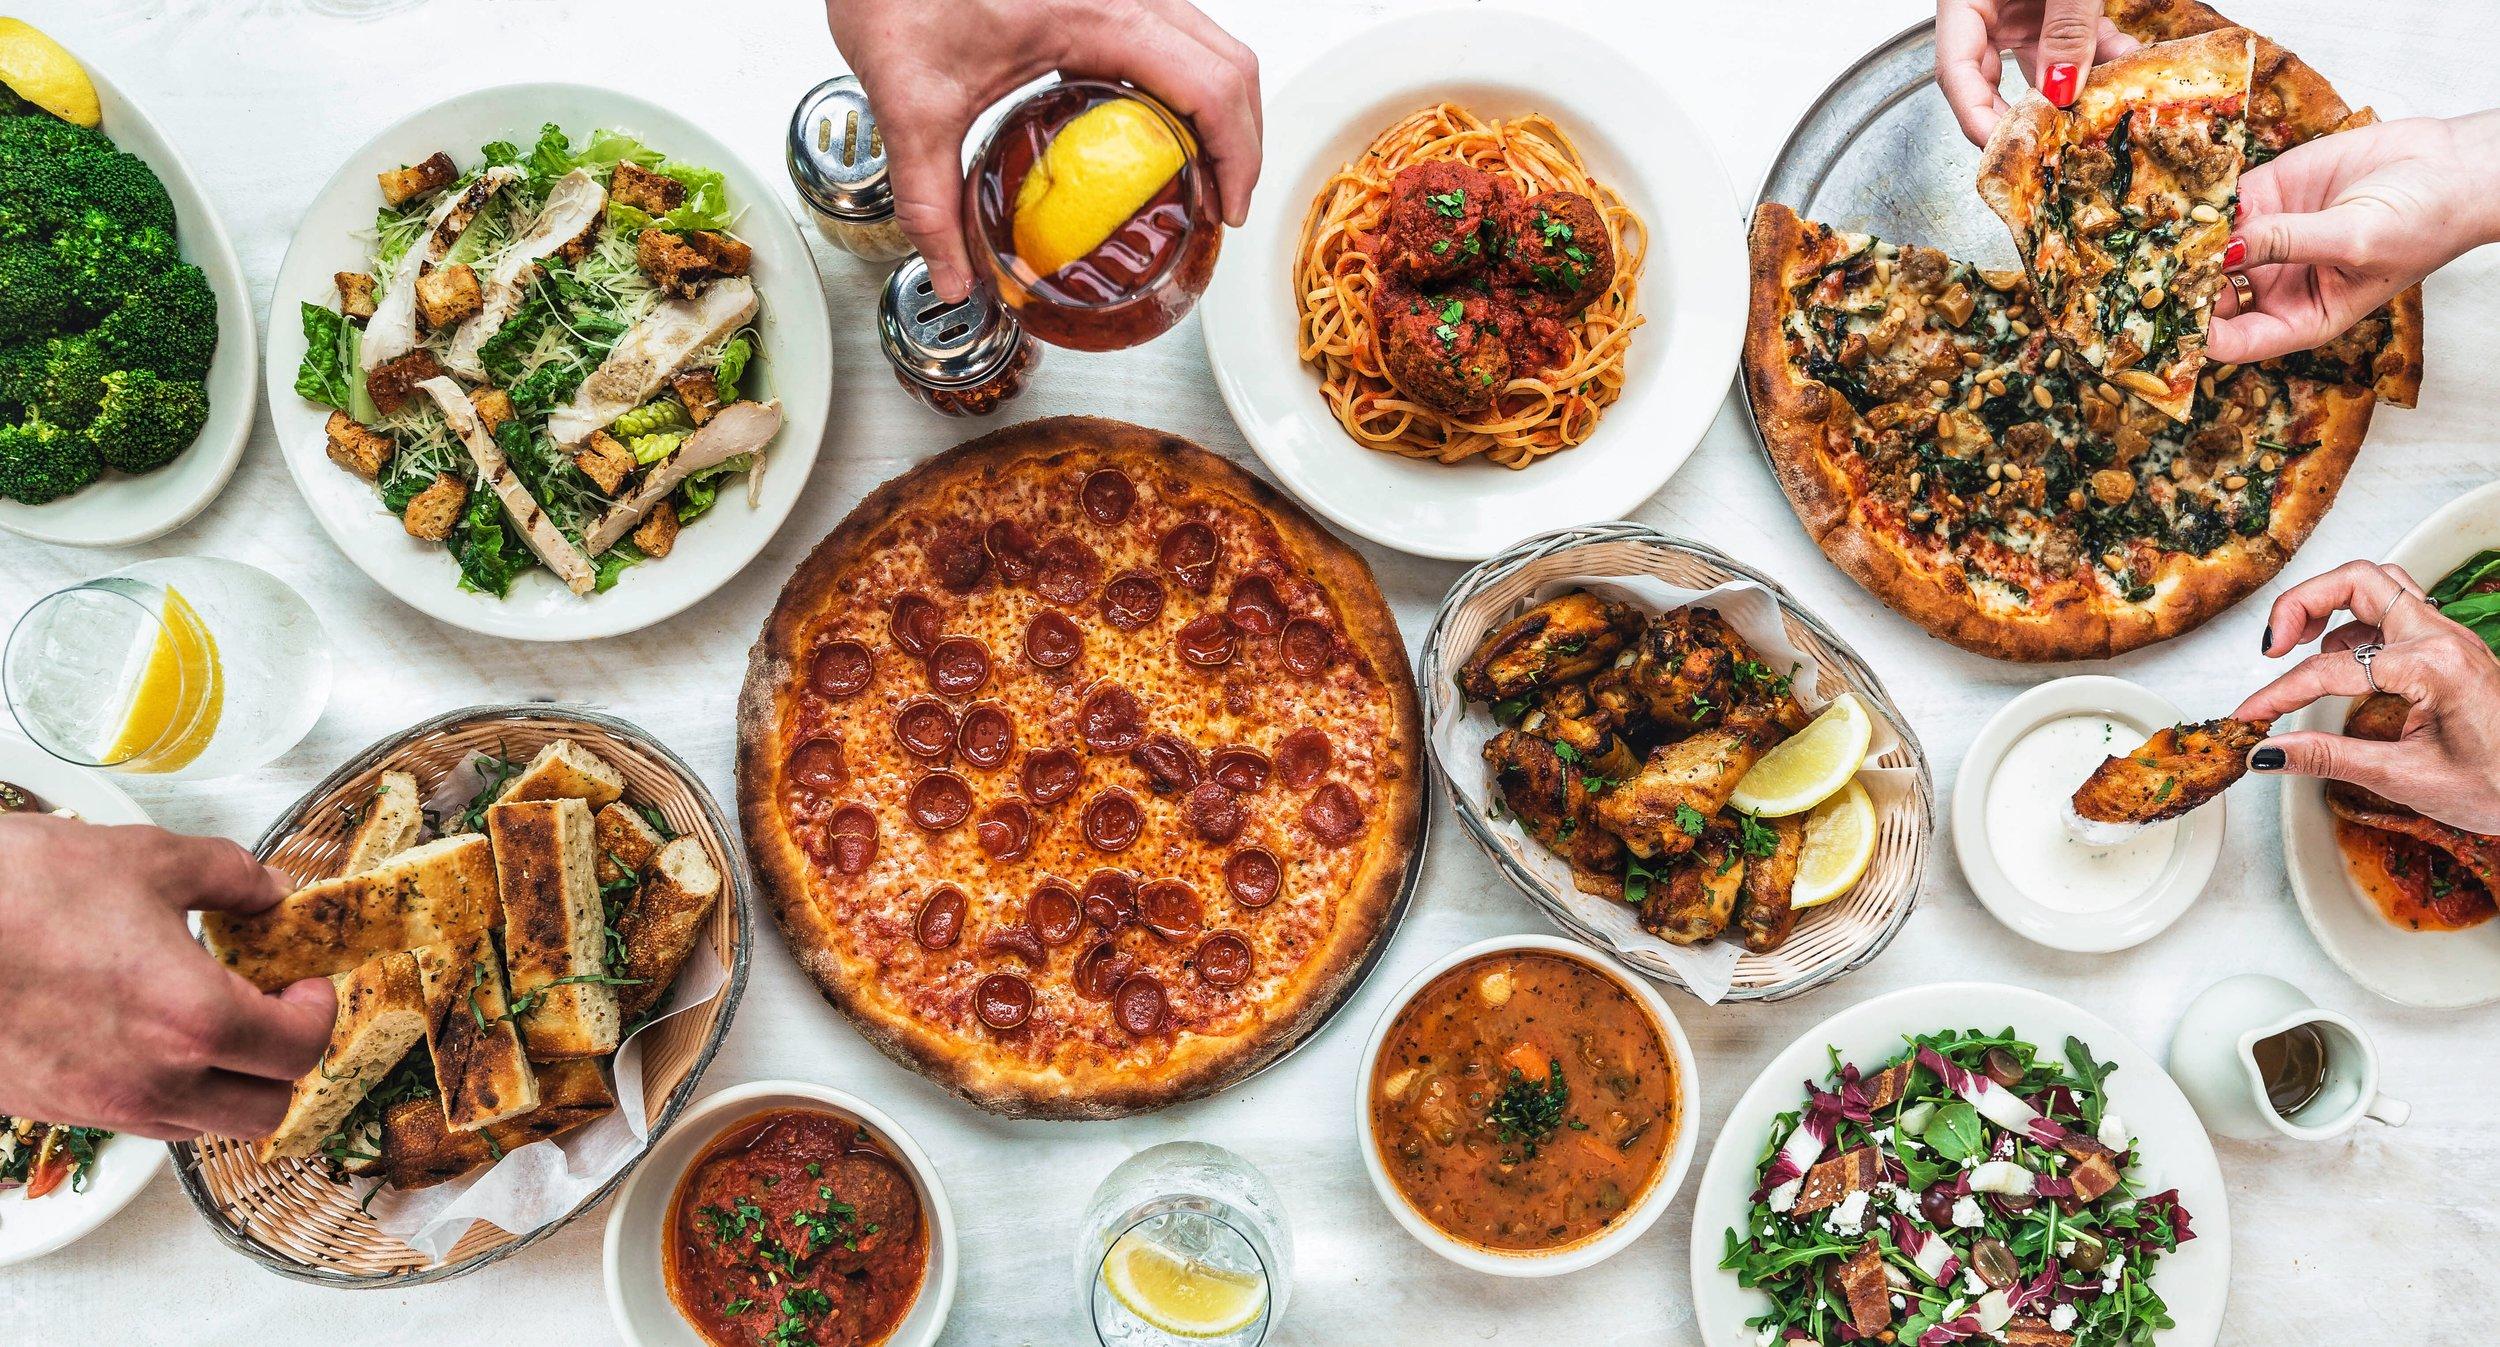 Food spread with hands grabbing food